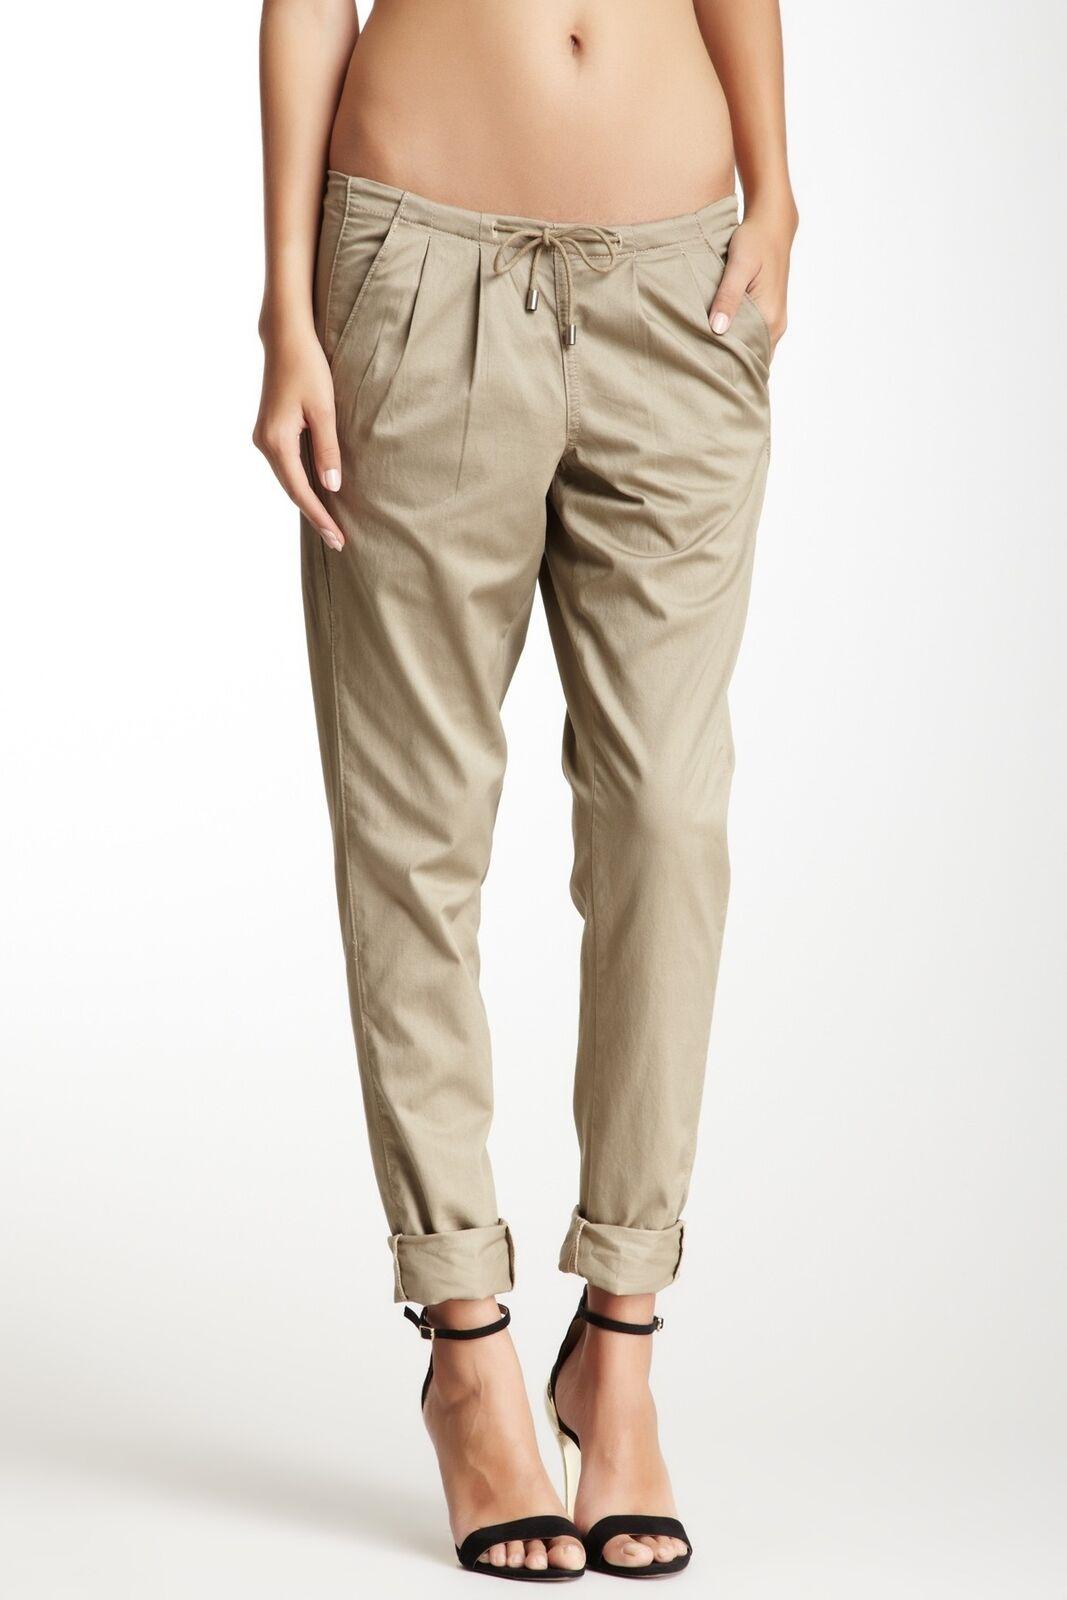 BLANK NYC 148351 Women's Blank Denim Drawstring Pant color Khaki Sz 30